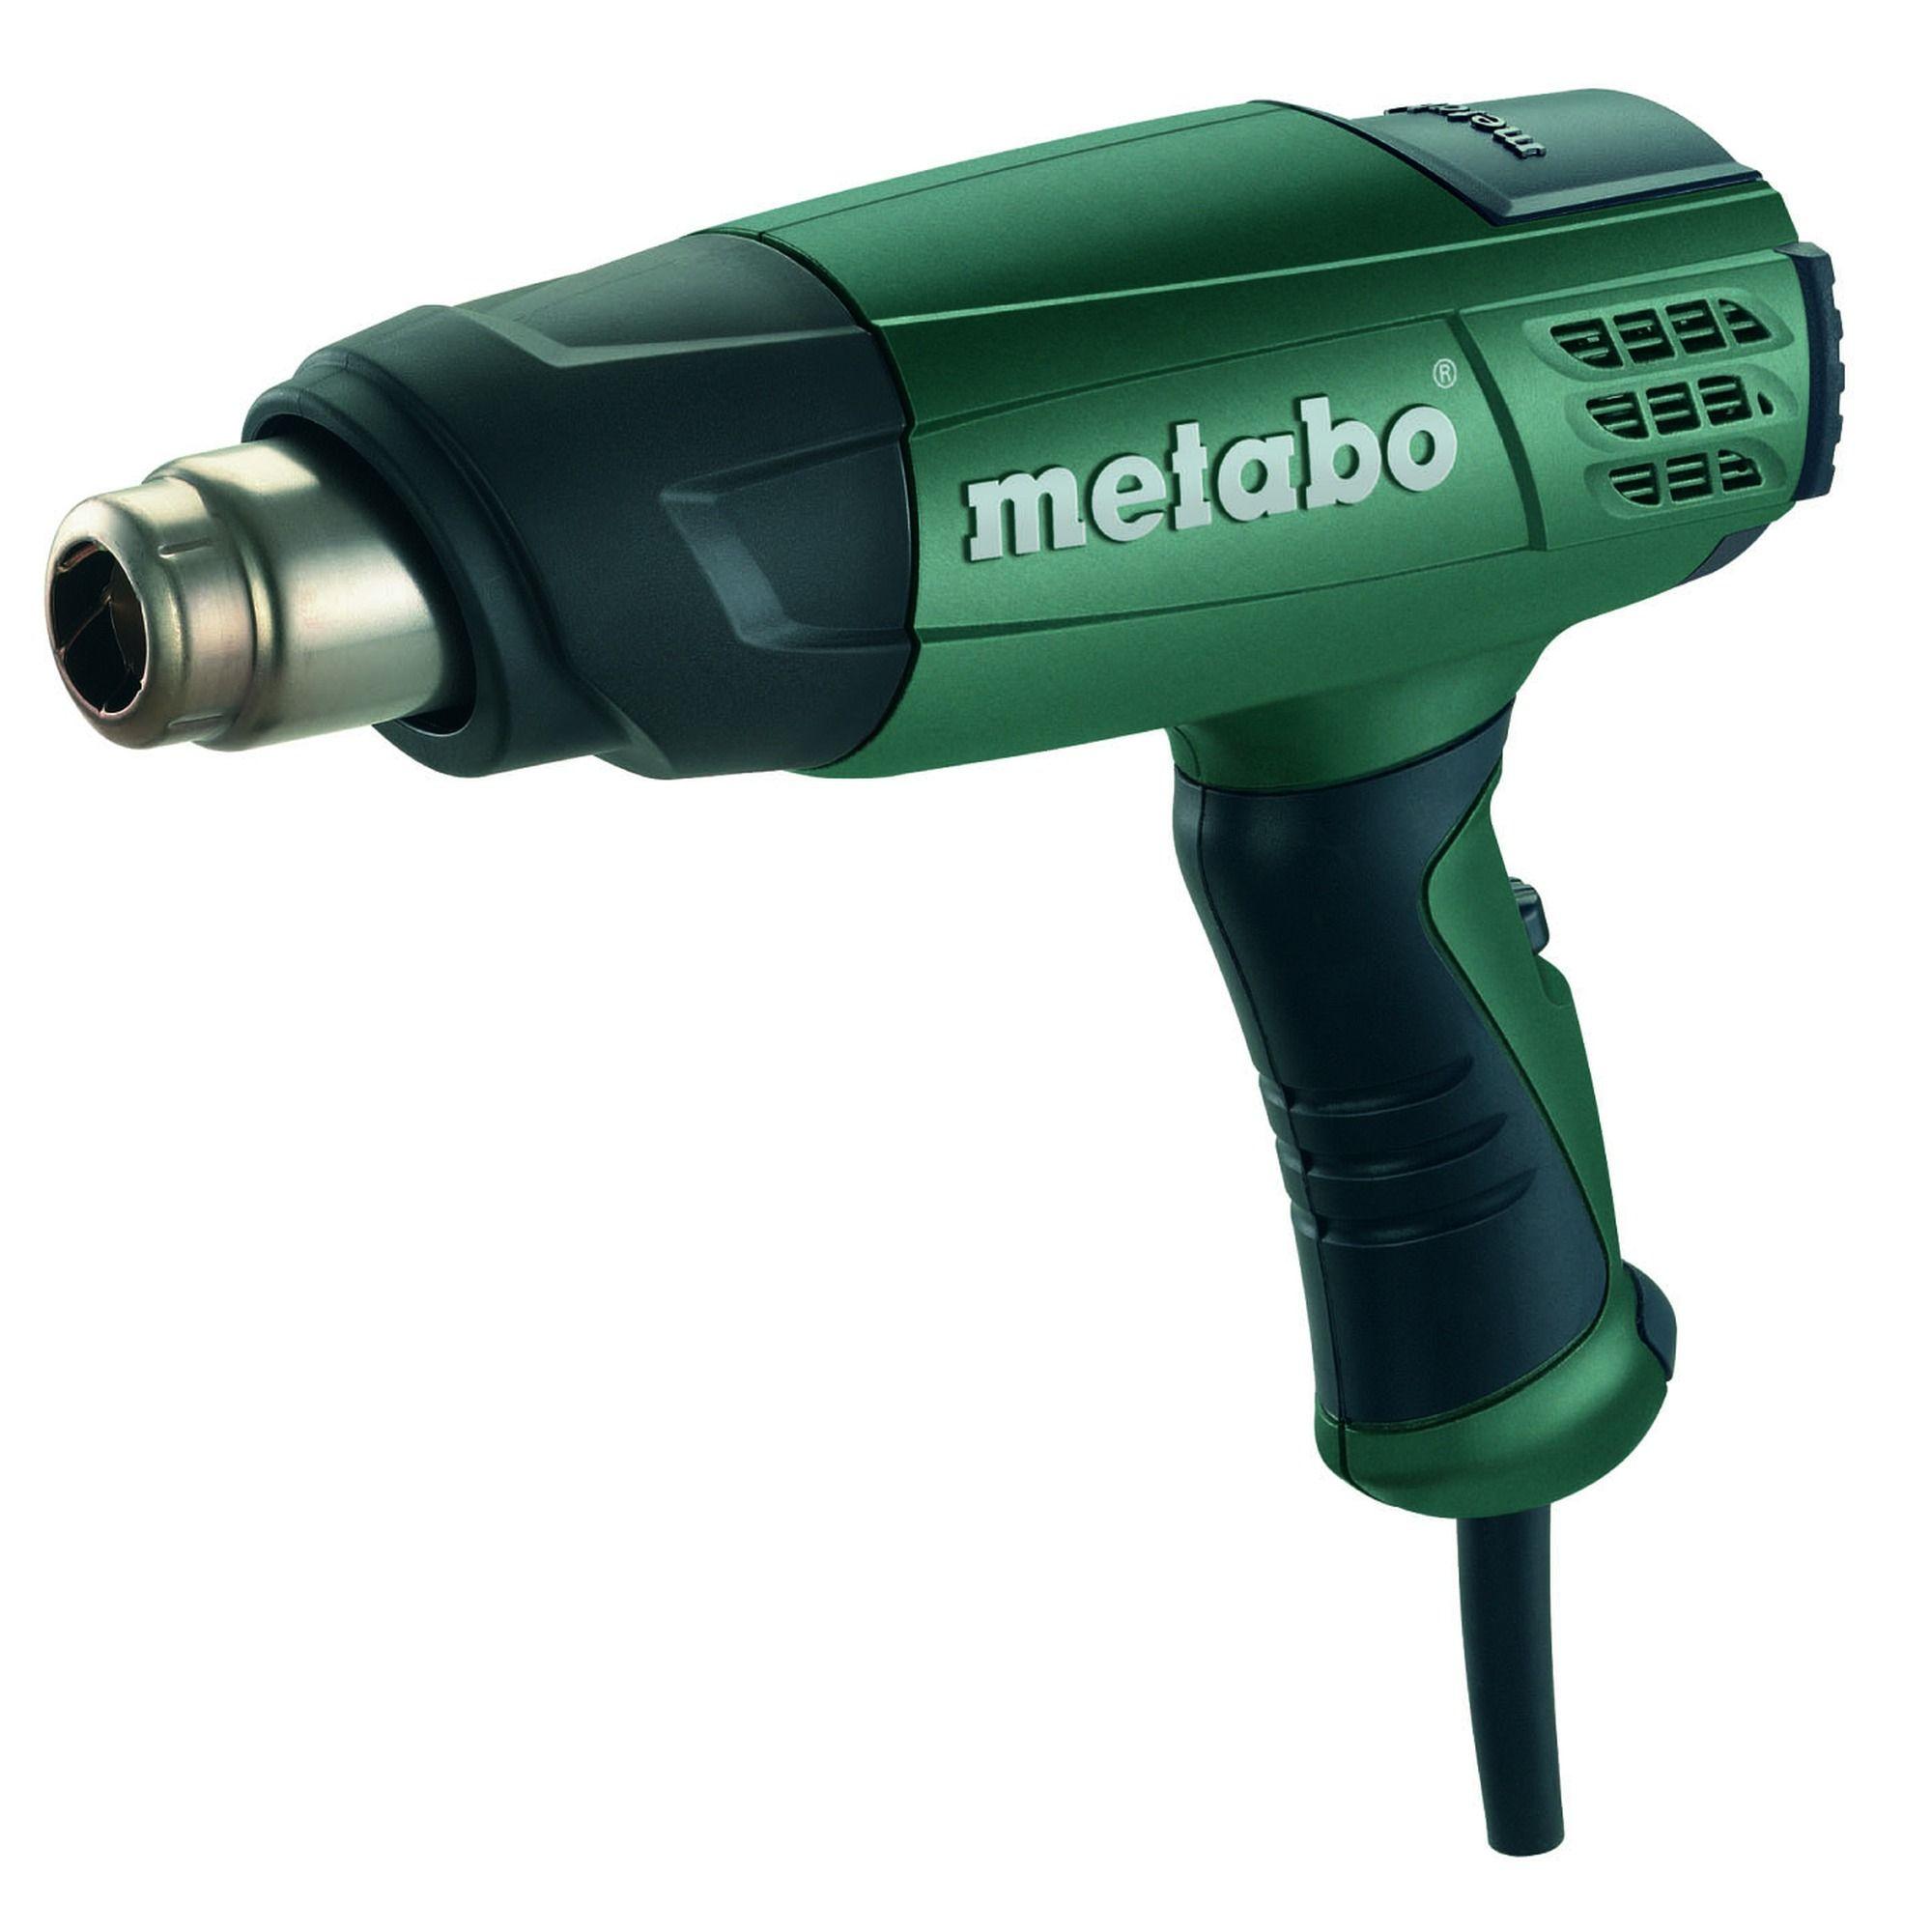 Metabo heteluchtpistool H16500 Removing laminate flooring